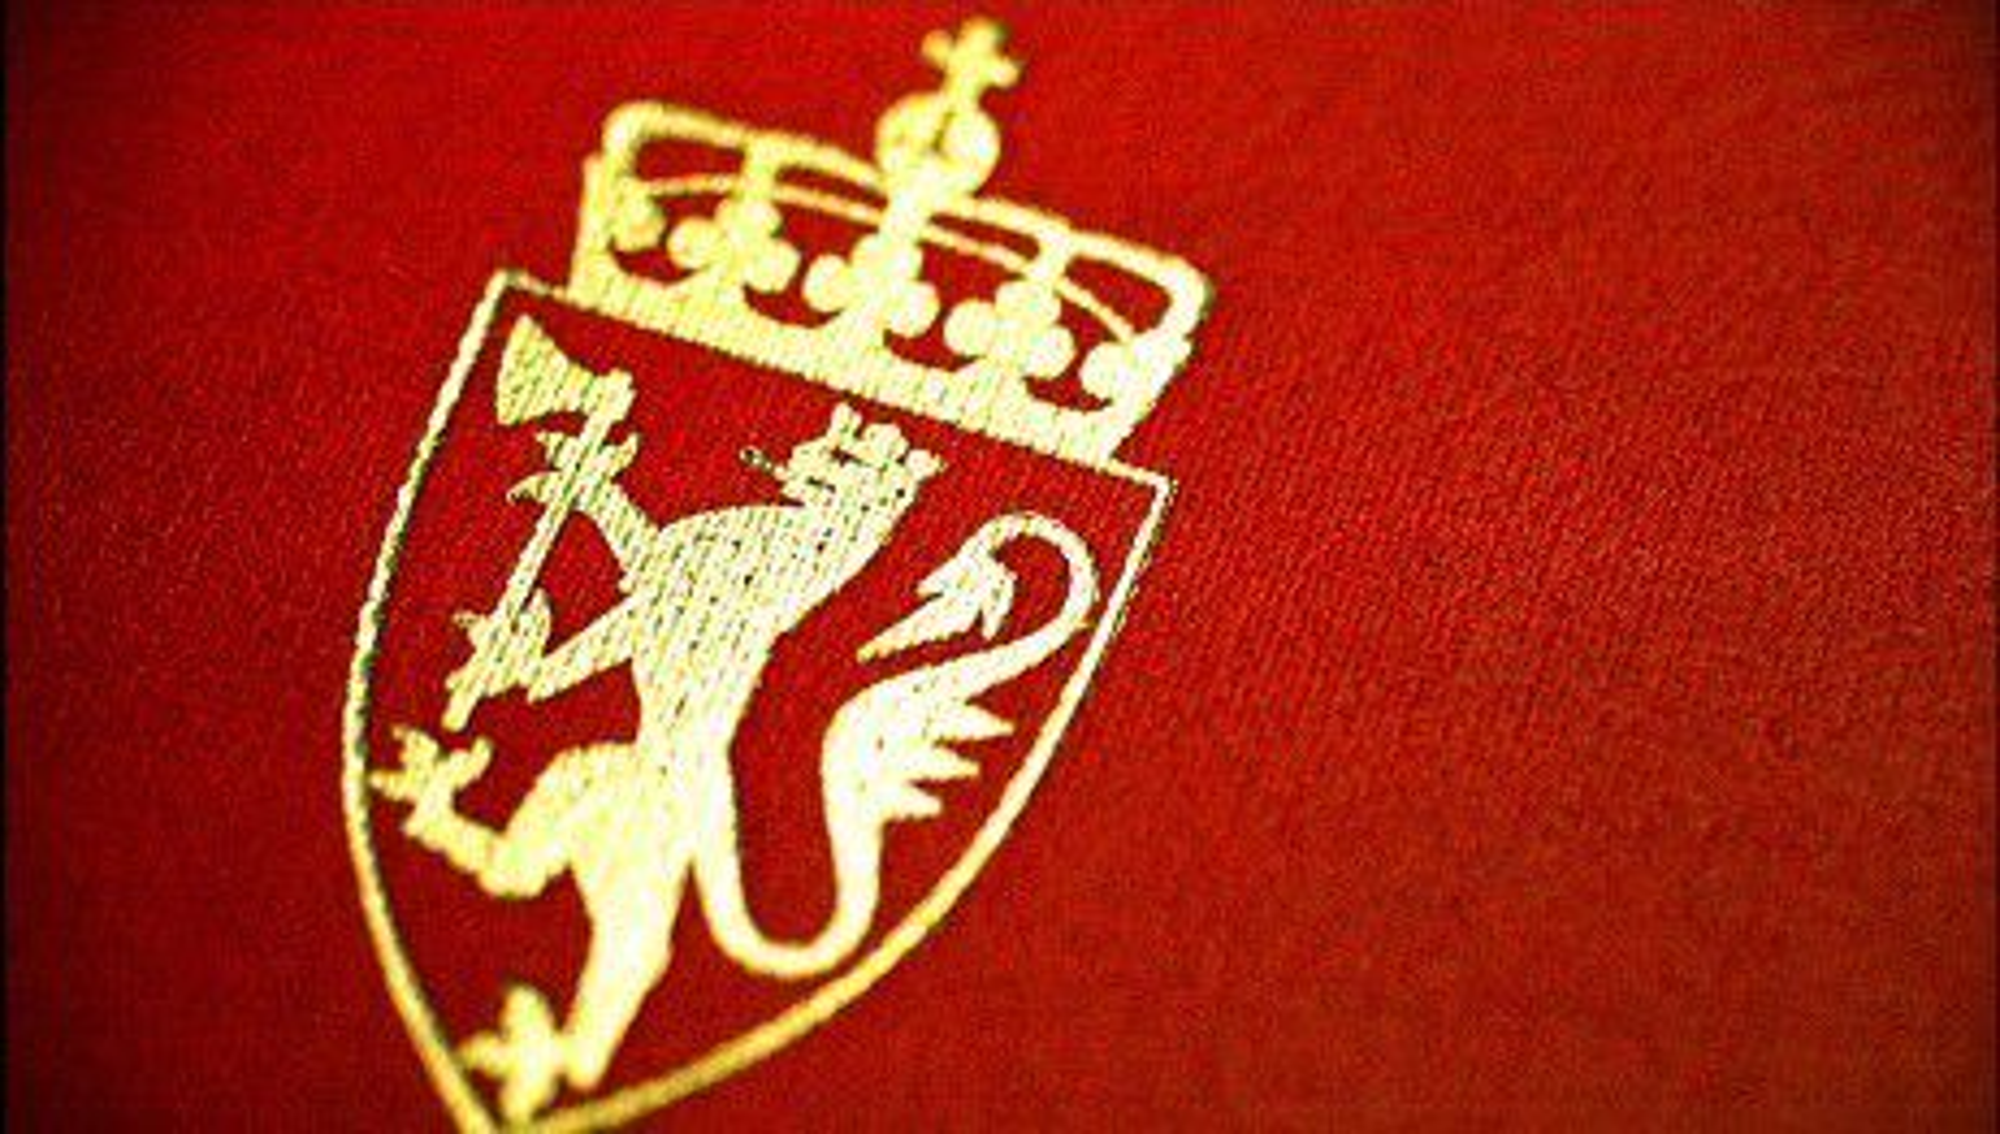 Harstad kommune bryter loven